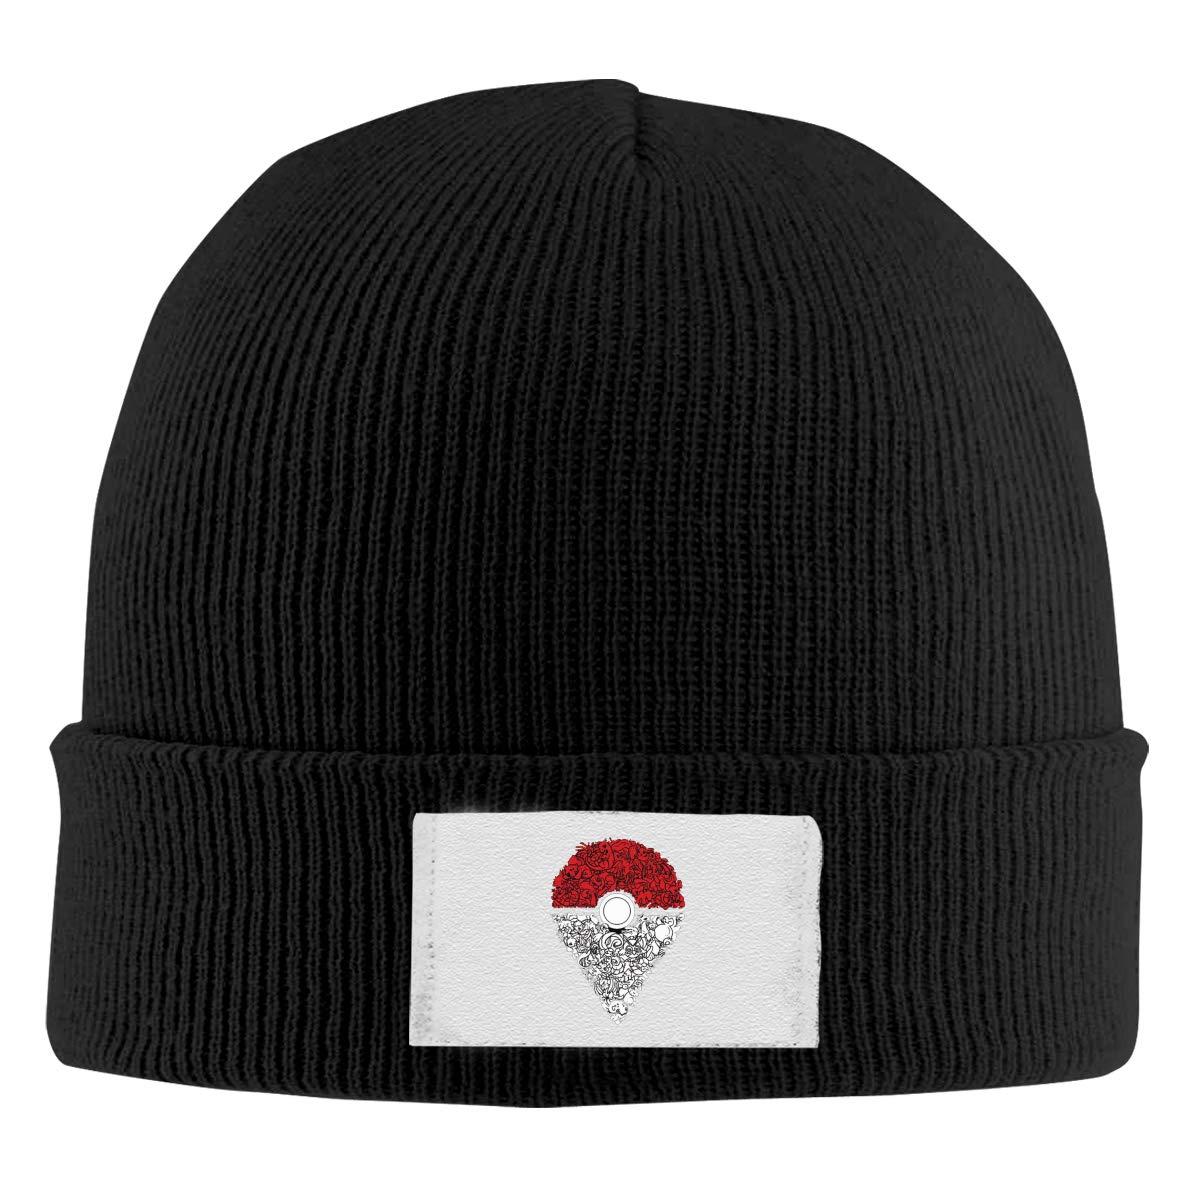 Unisex Stylish Slouch Beanie Hats Black Go Locator Top Level Beanie Men Women